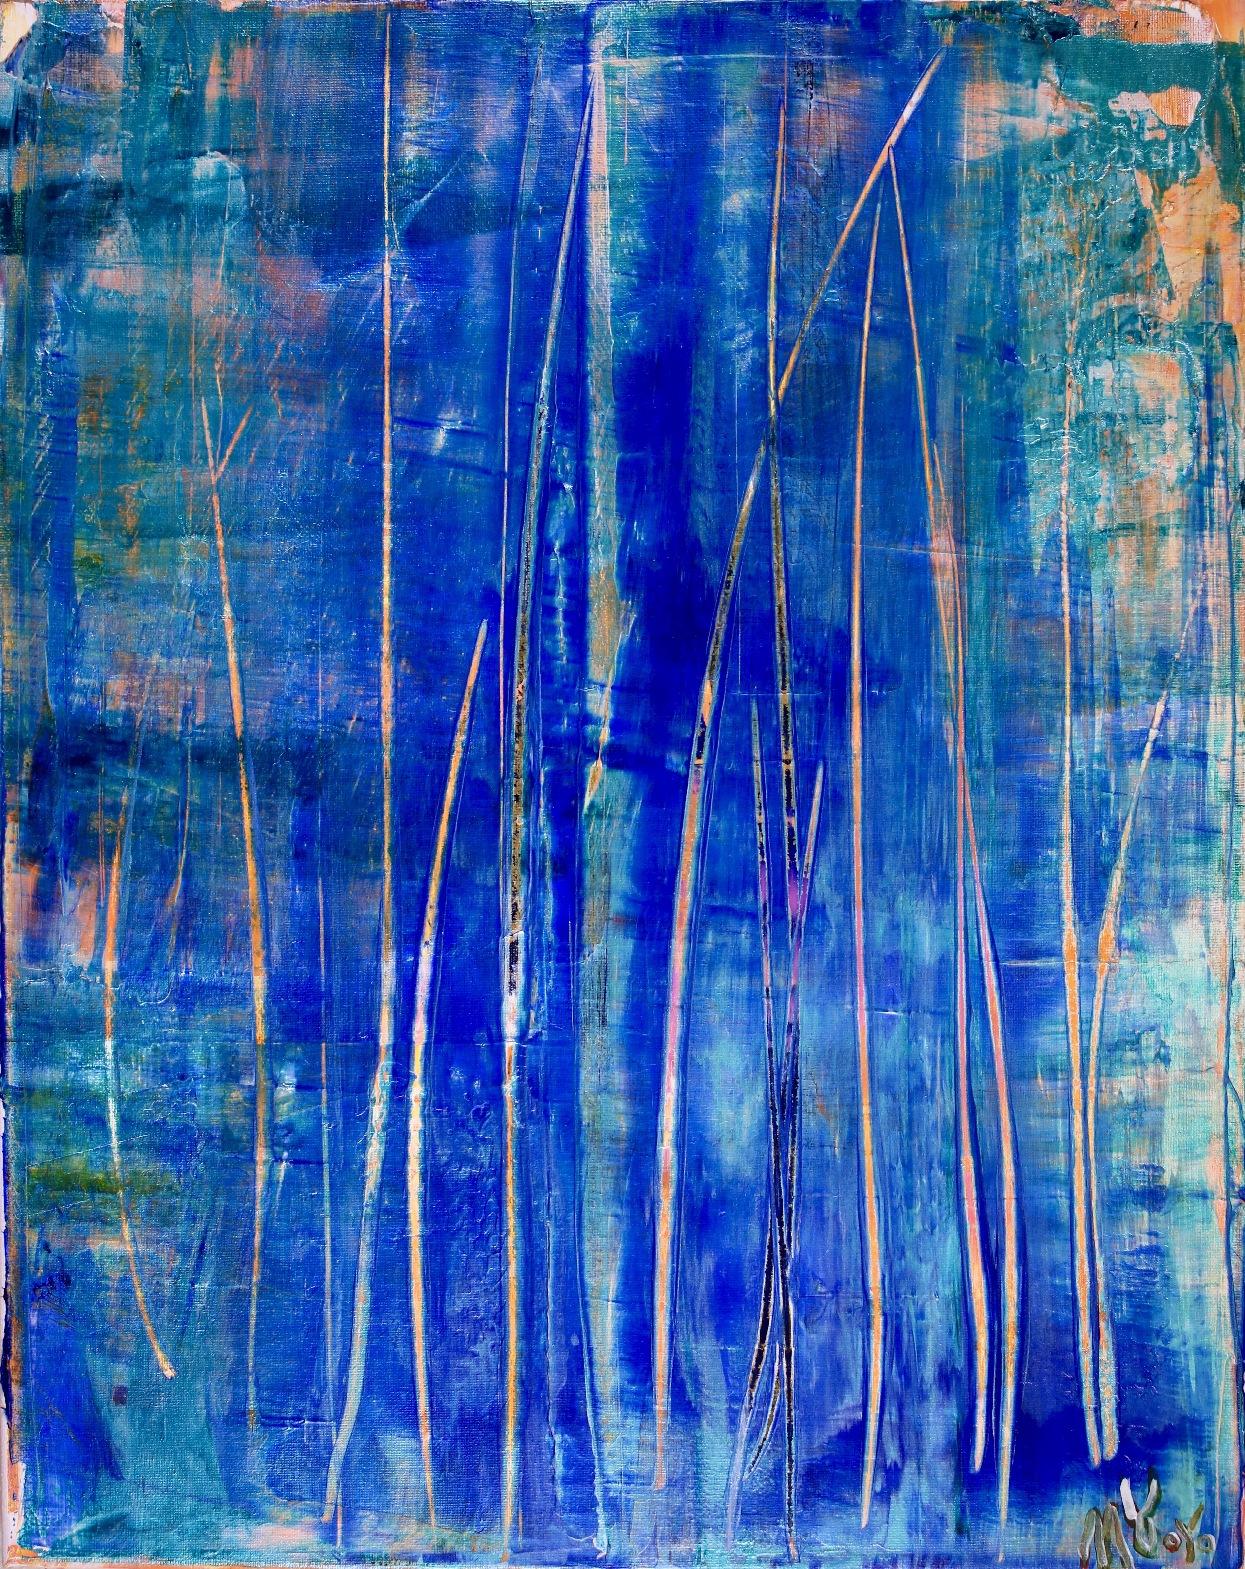 SOLD - Interrupted Frequencies (2018) - Right Canvas / Diptych / Artist: Nestor Toro